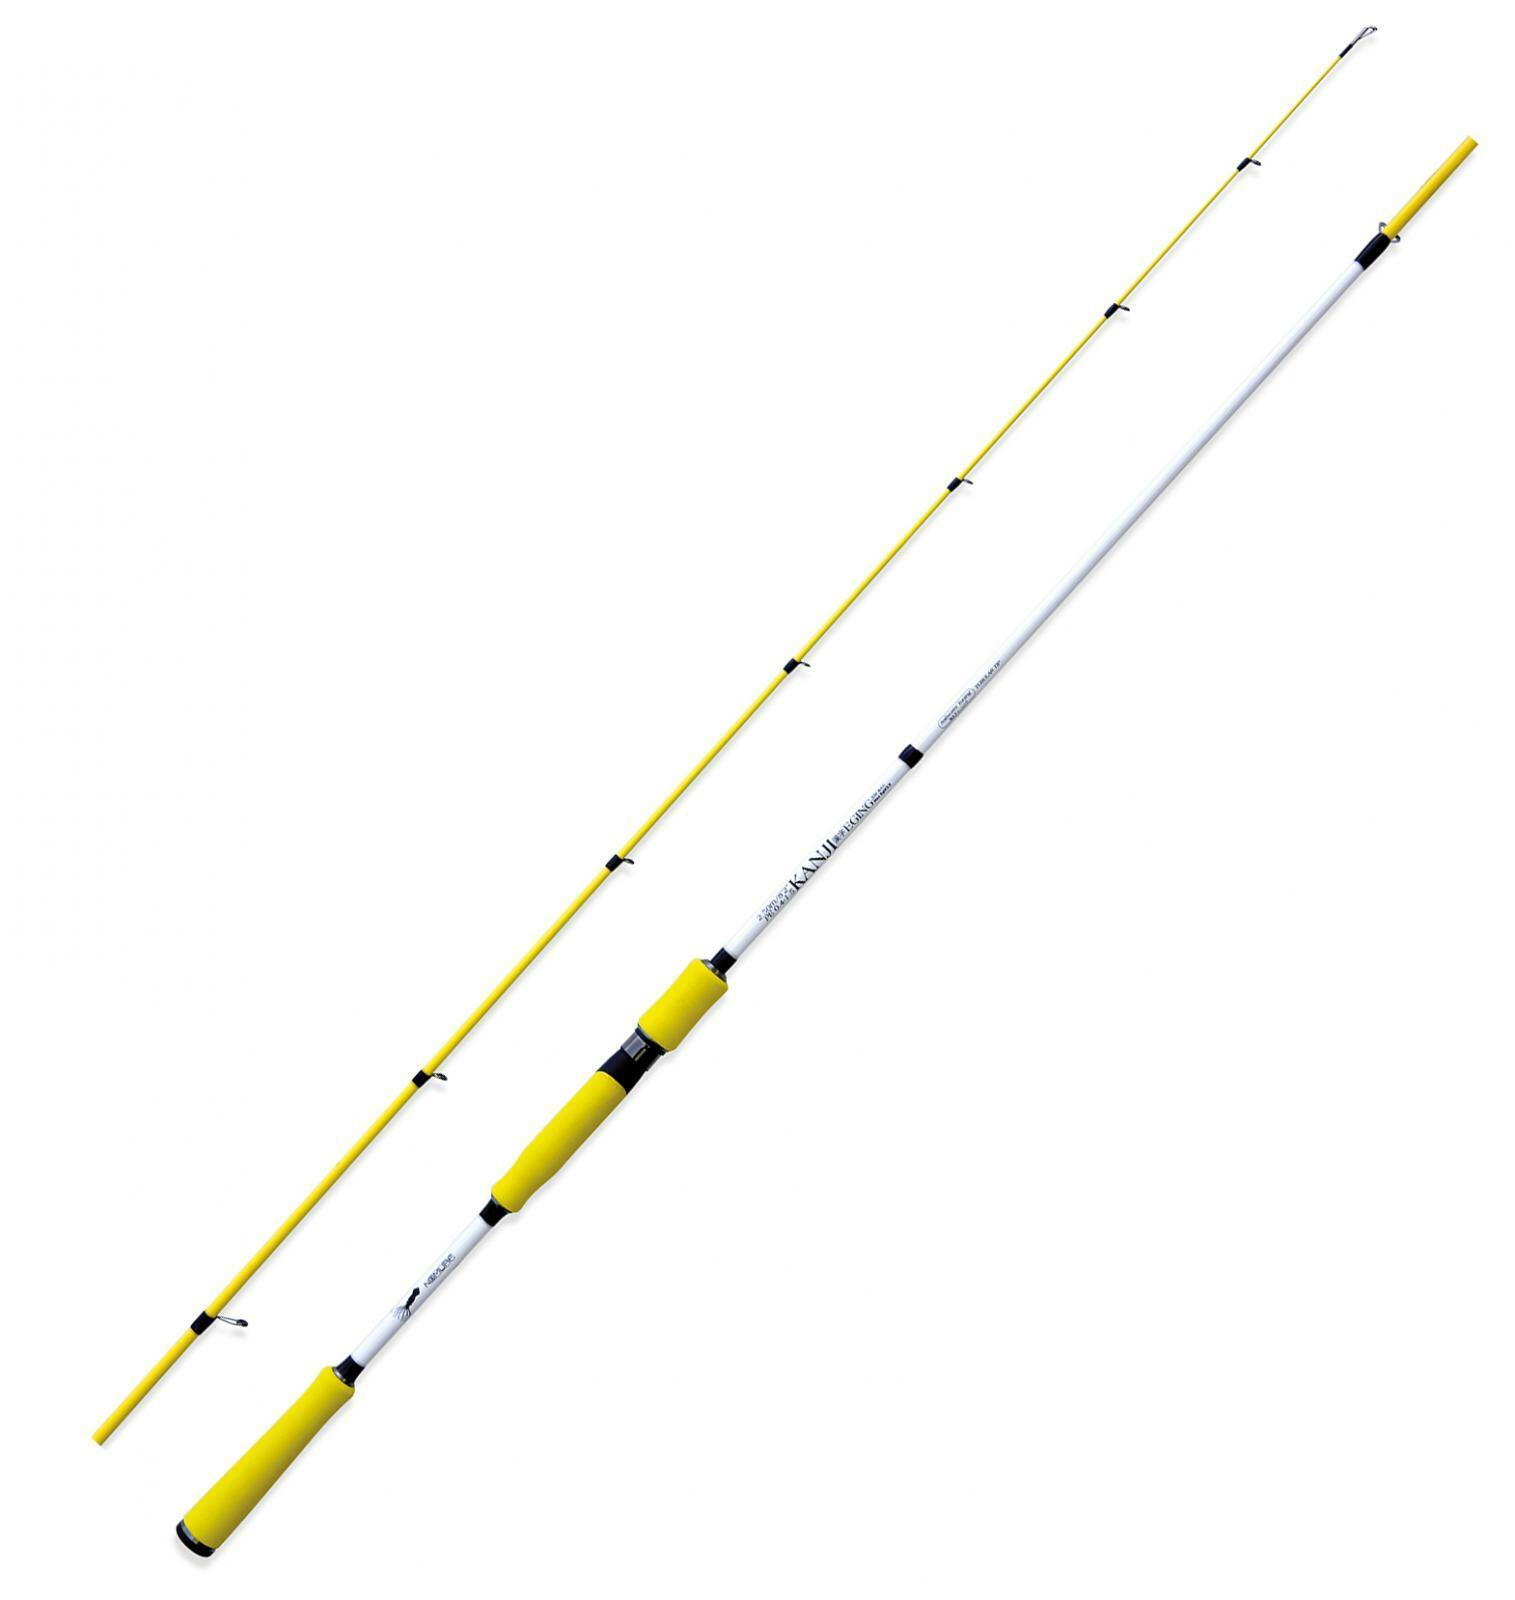 NM23112025 Nomura canna pesca Eging SW Kanji 250 seppia cefalopodi RNG